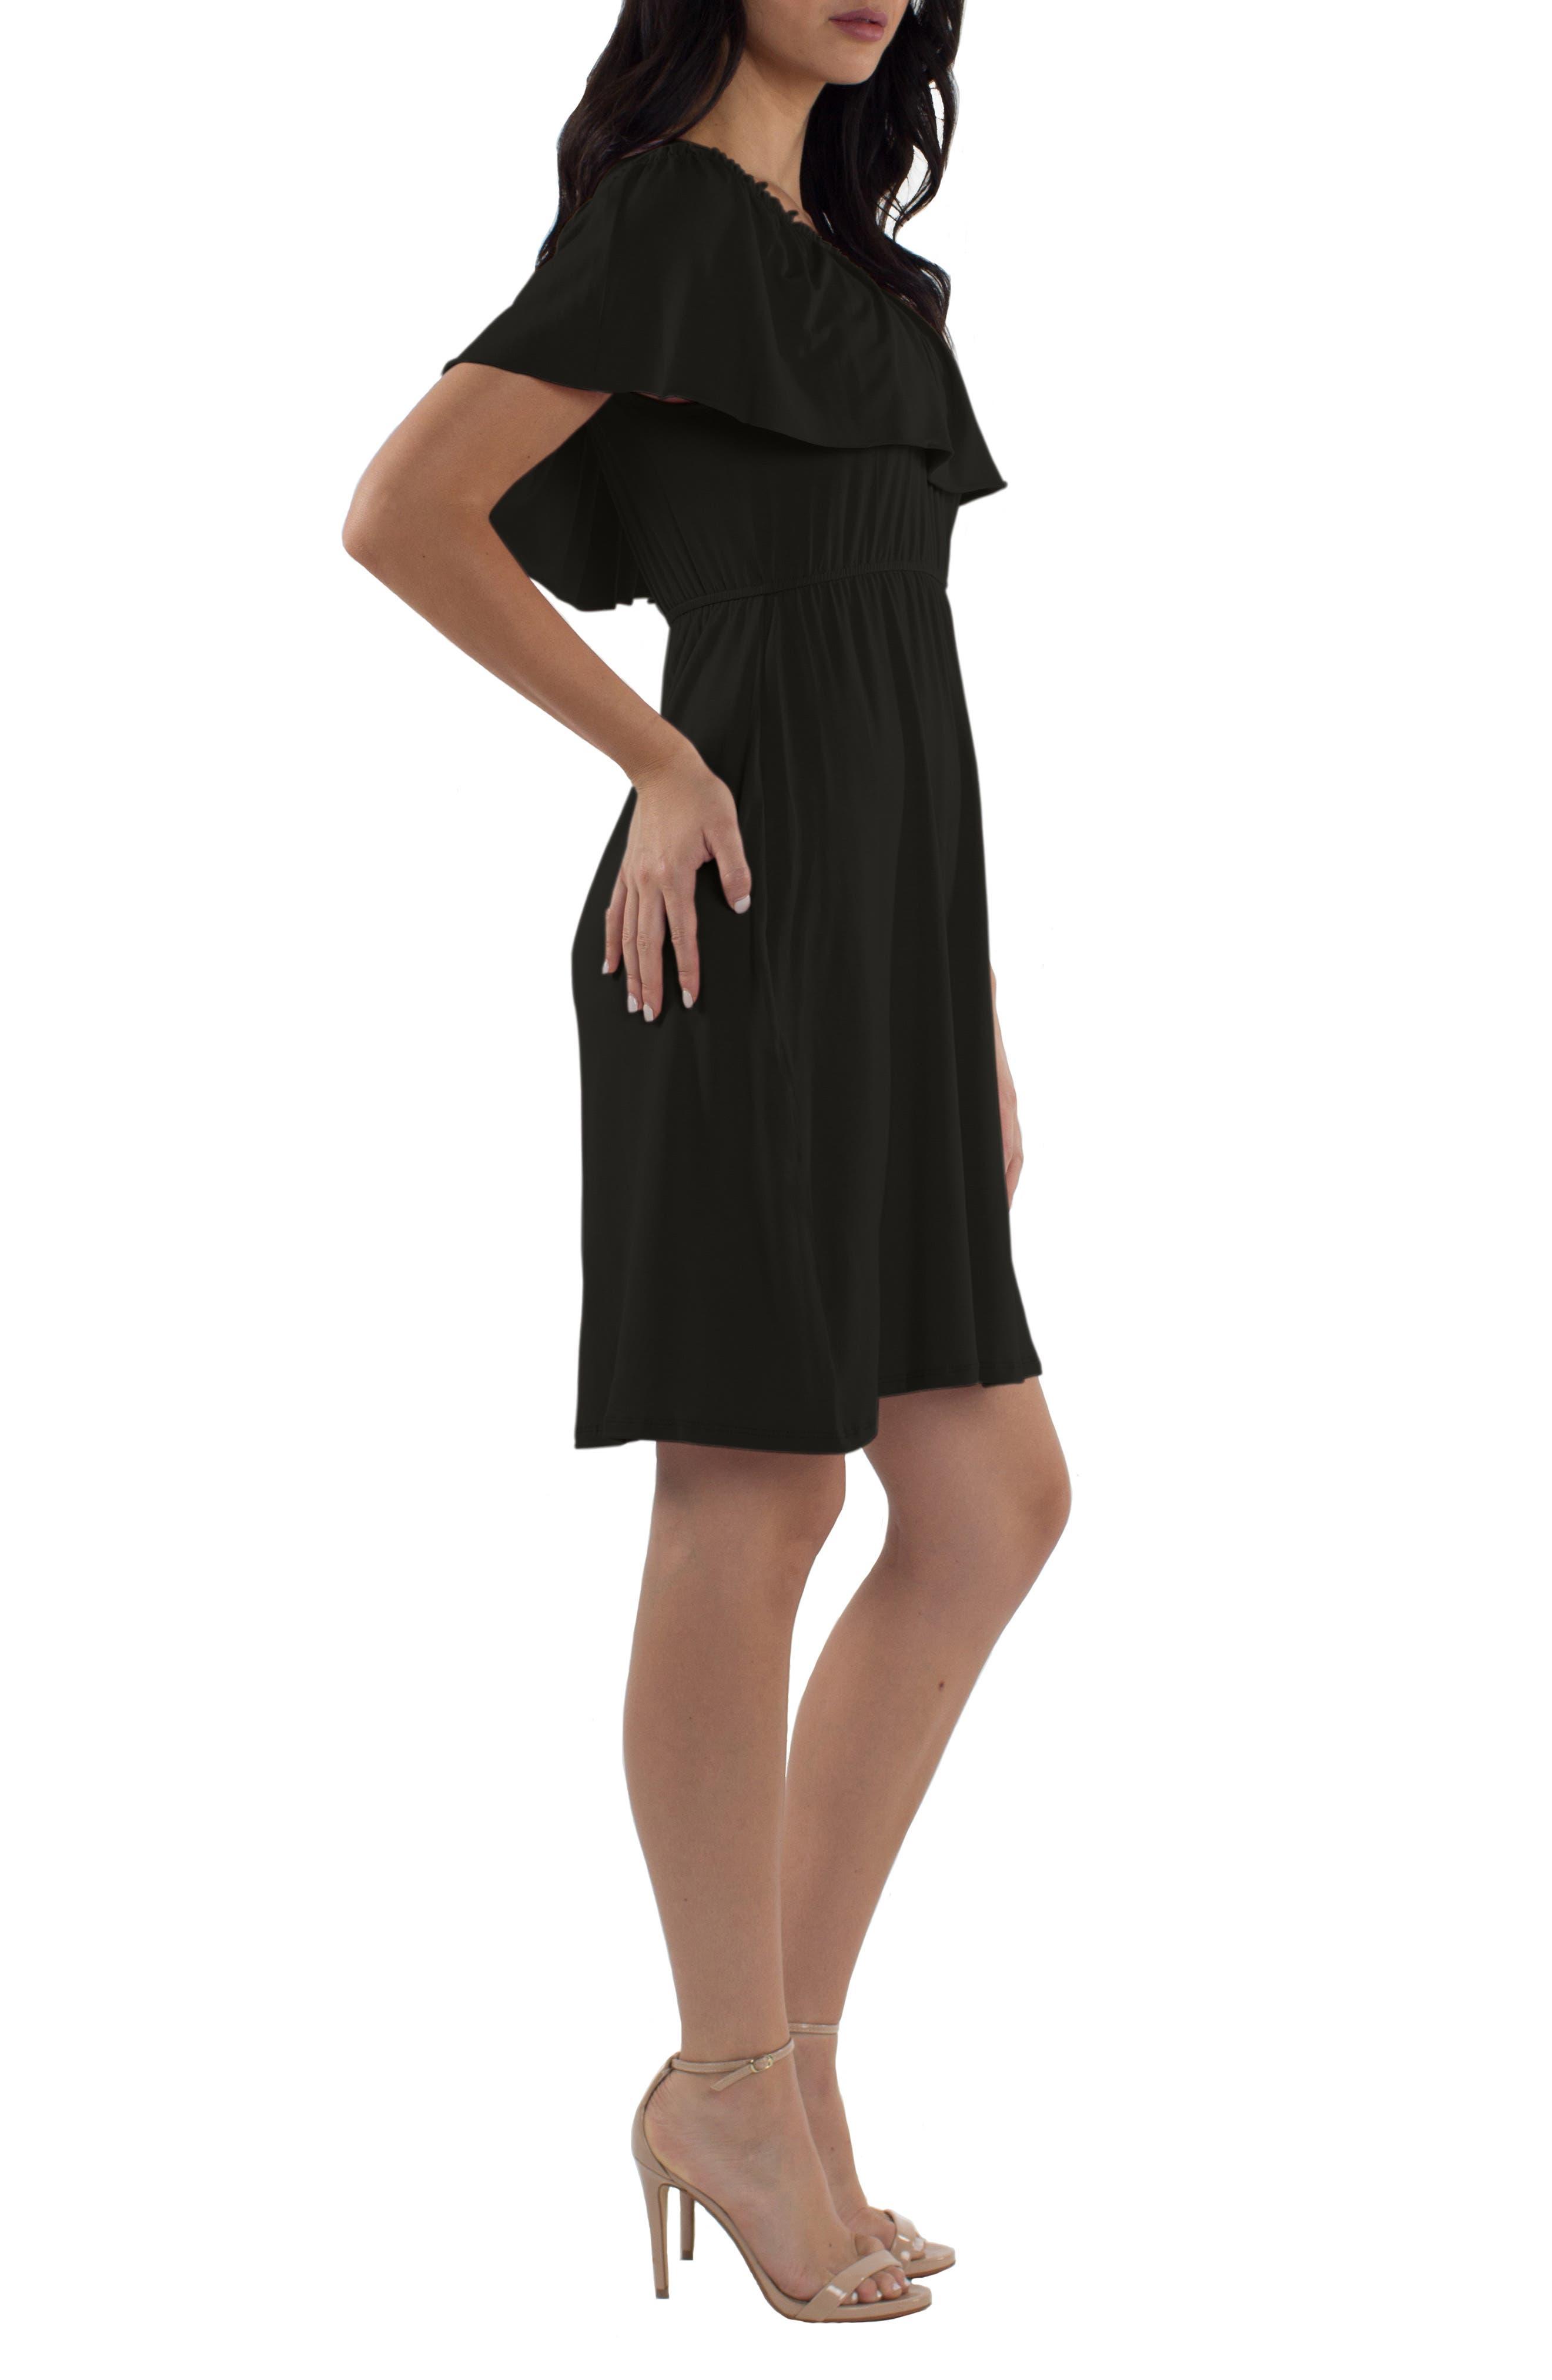 Reagan Nursing Dress,                             Alternate thumbnail 3, color,                             BLACK